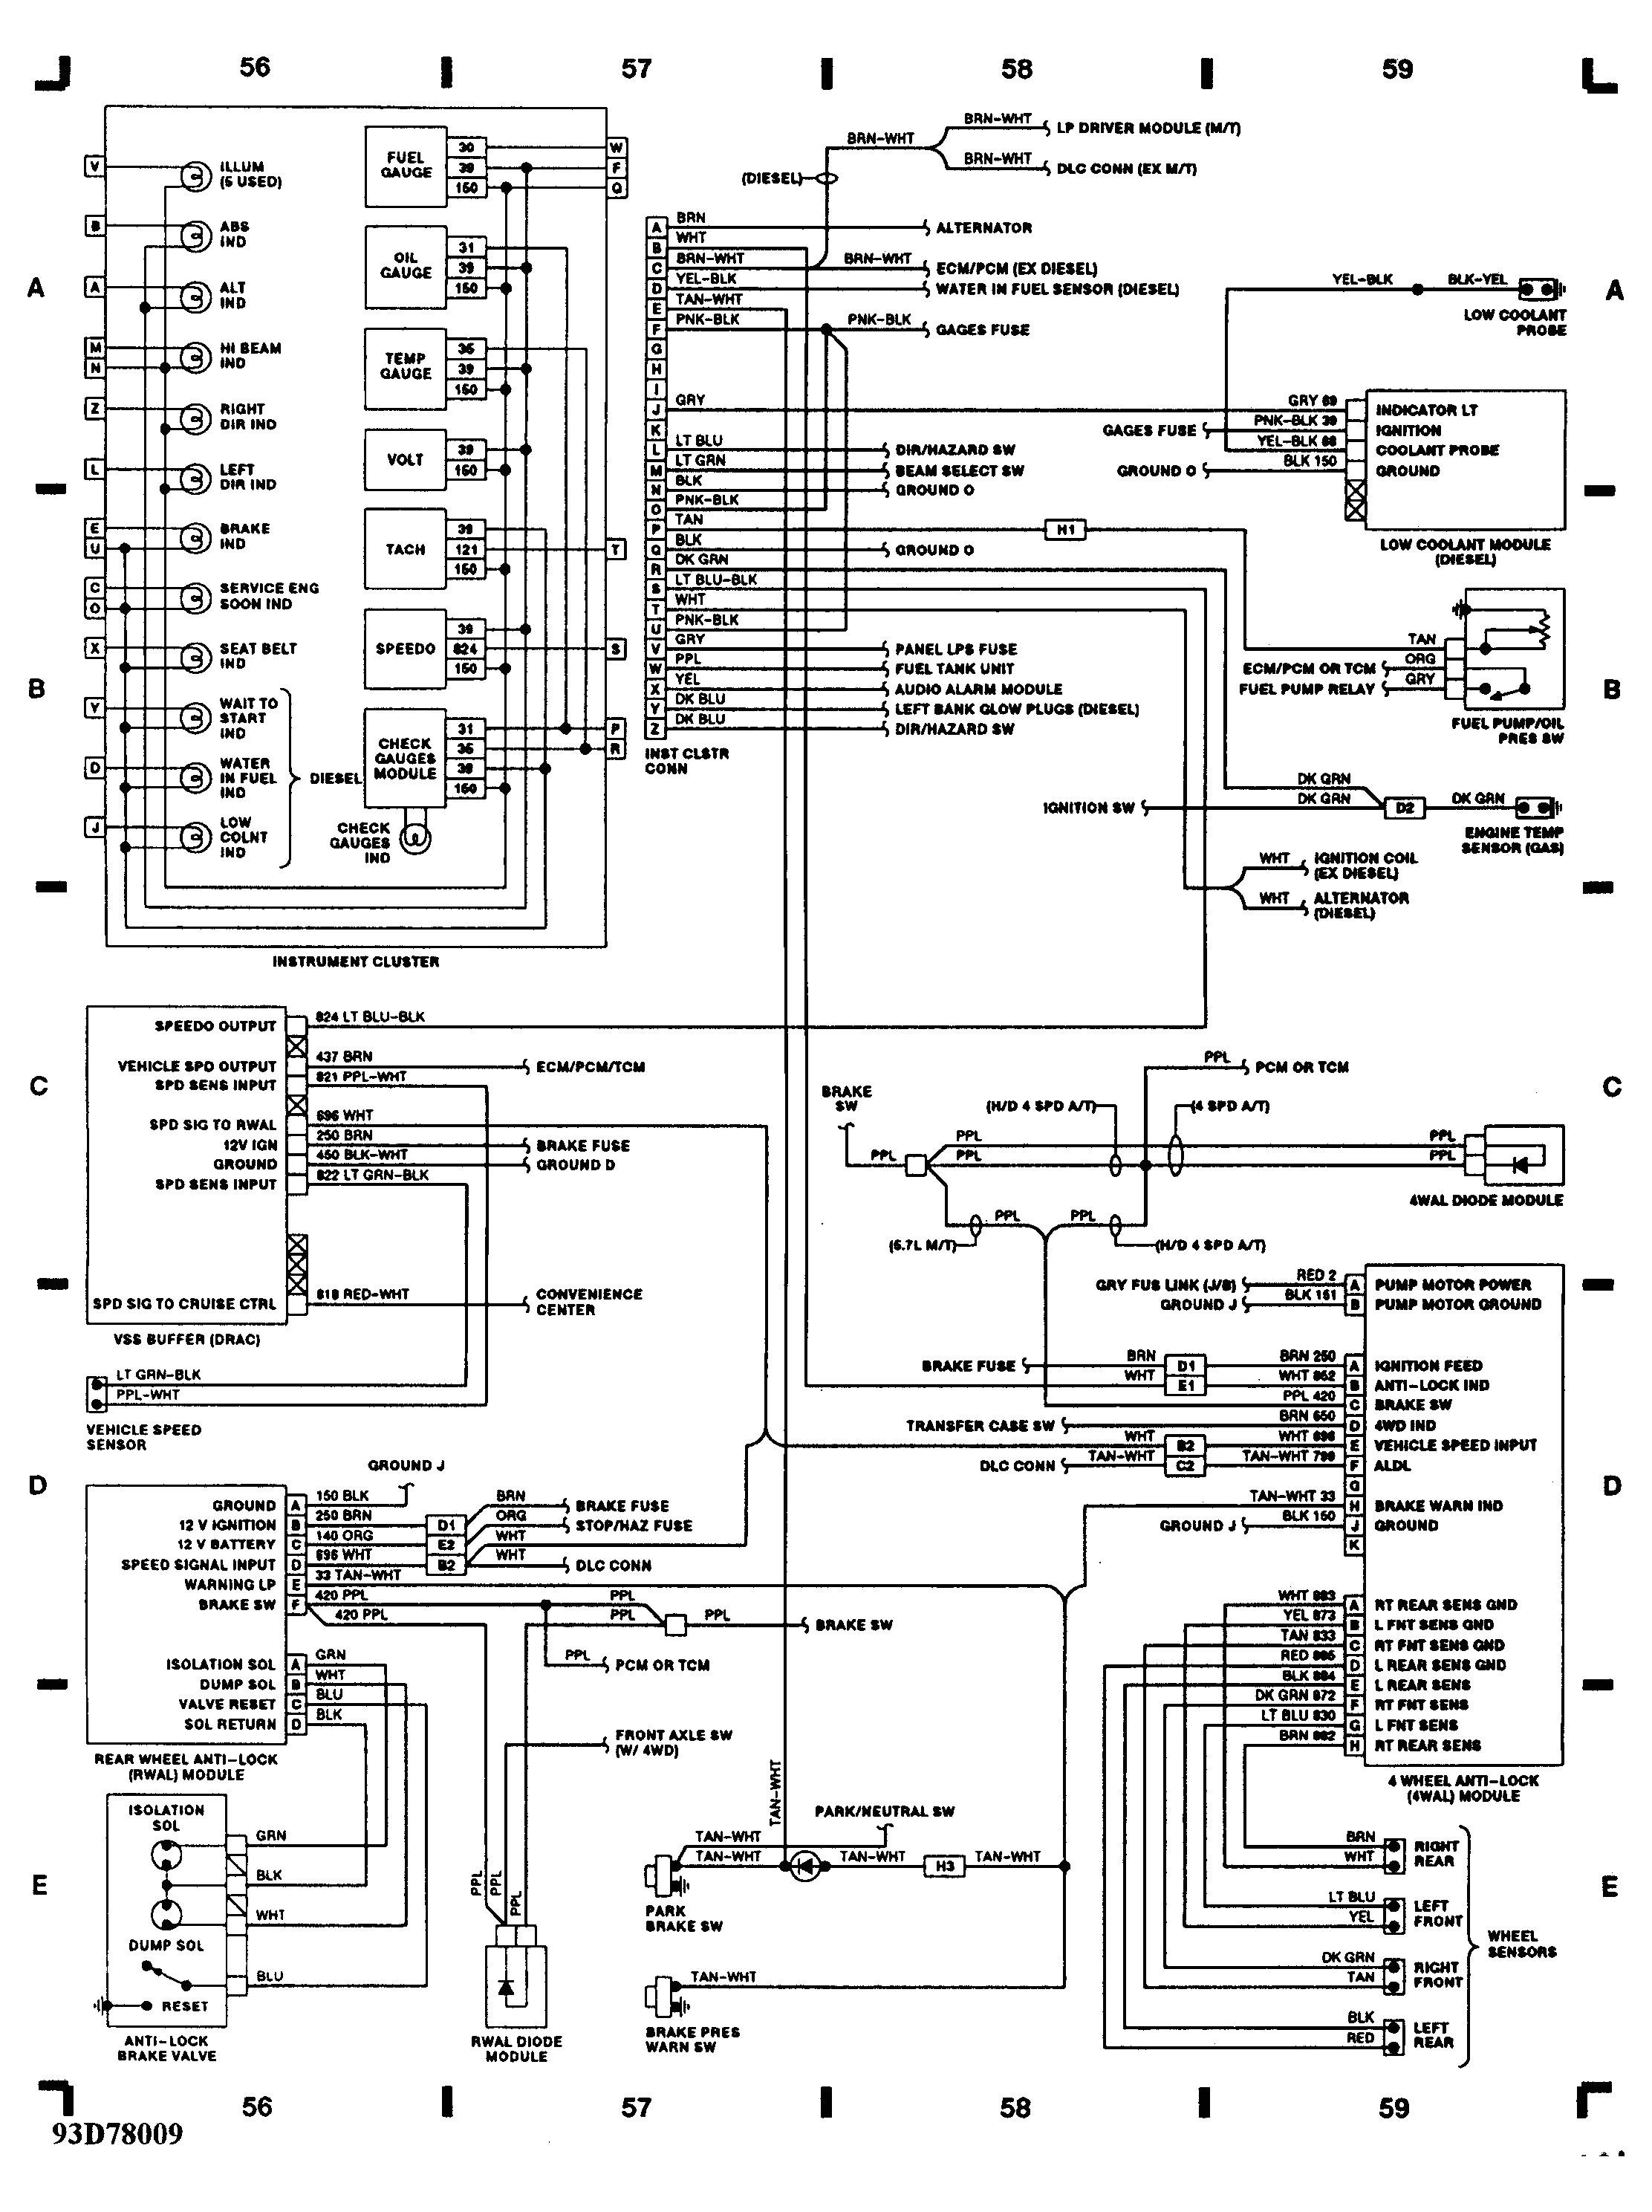 chevy silverado transmission diagram schema wiring diagram 2005 chevy silverado 2500hd stereo wiring diagram wiring diagram 2005 chevy silverado